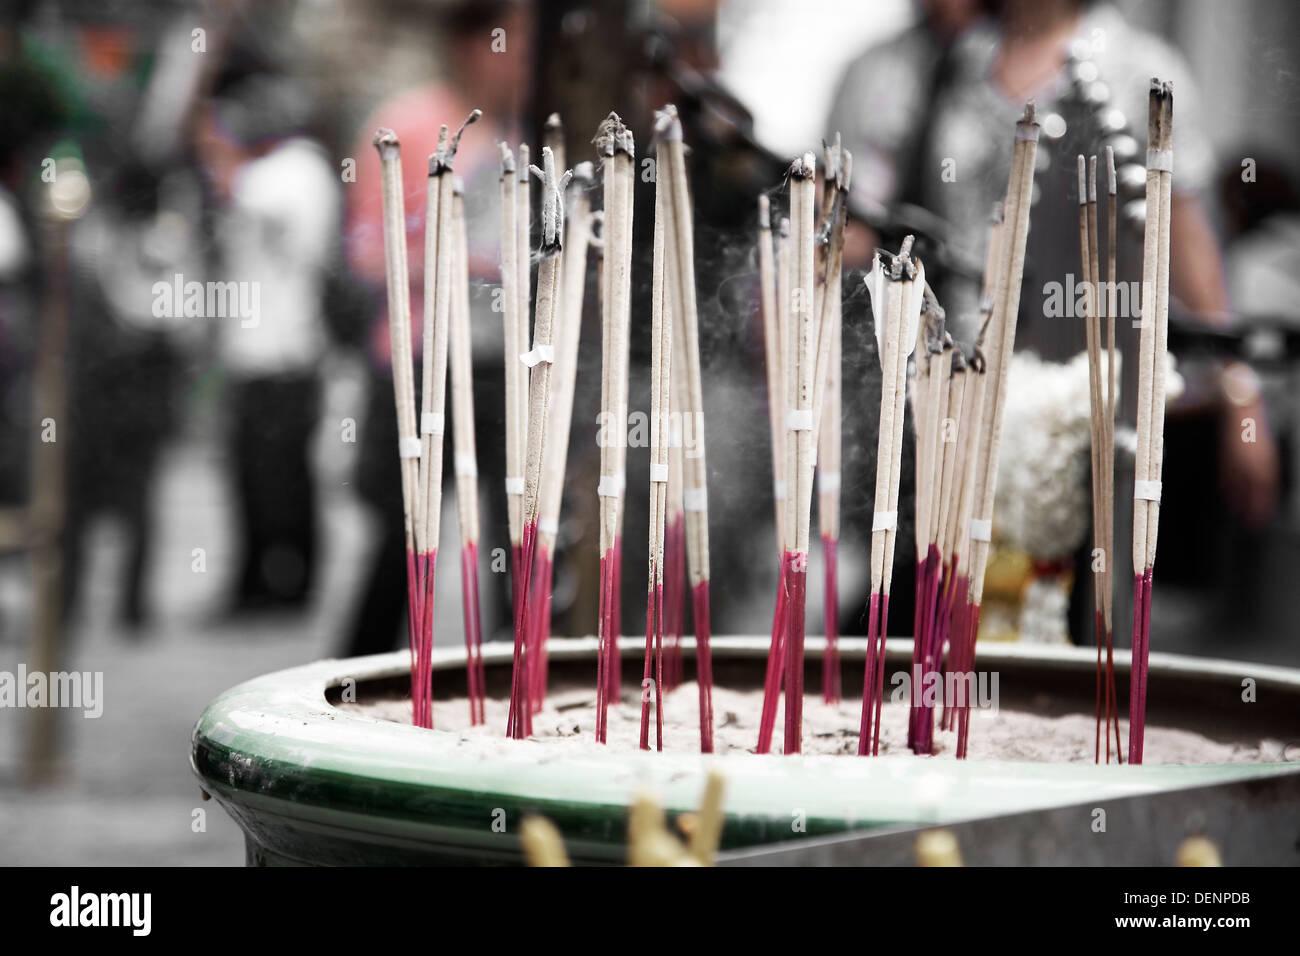 Incense sticks. Wat Phra Kaew, or Temple of the Emerald Buddha. Grand Palace. Bangkok, Thailand, Asia. - Stock Image